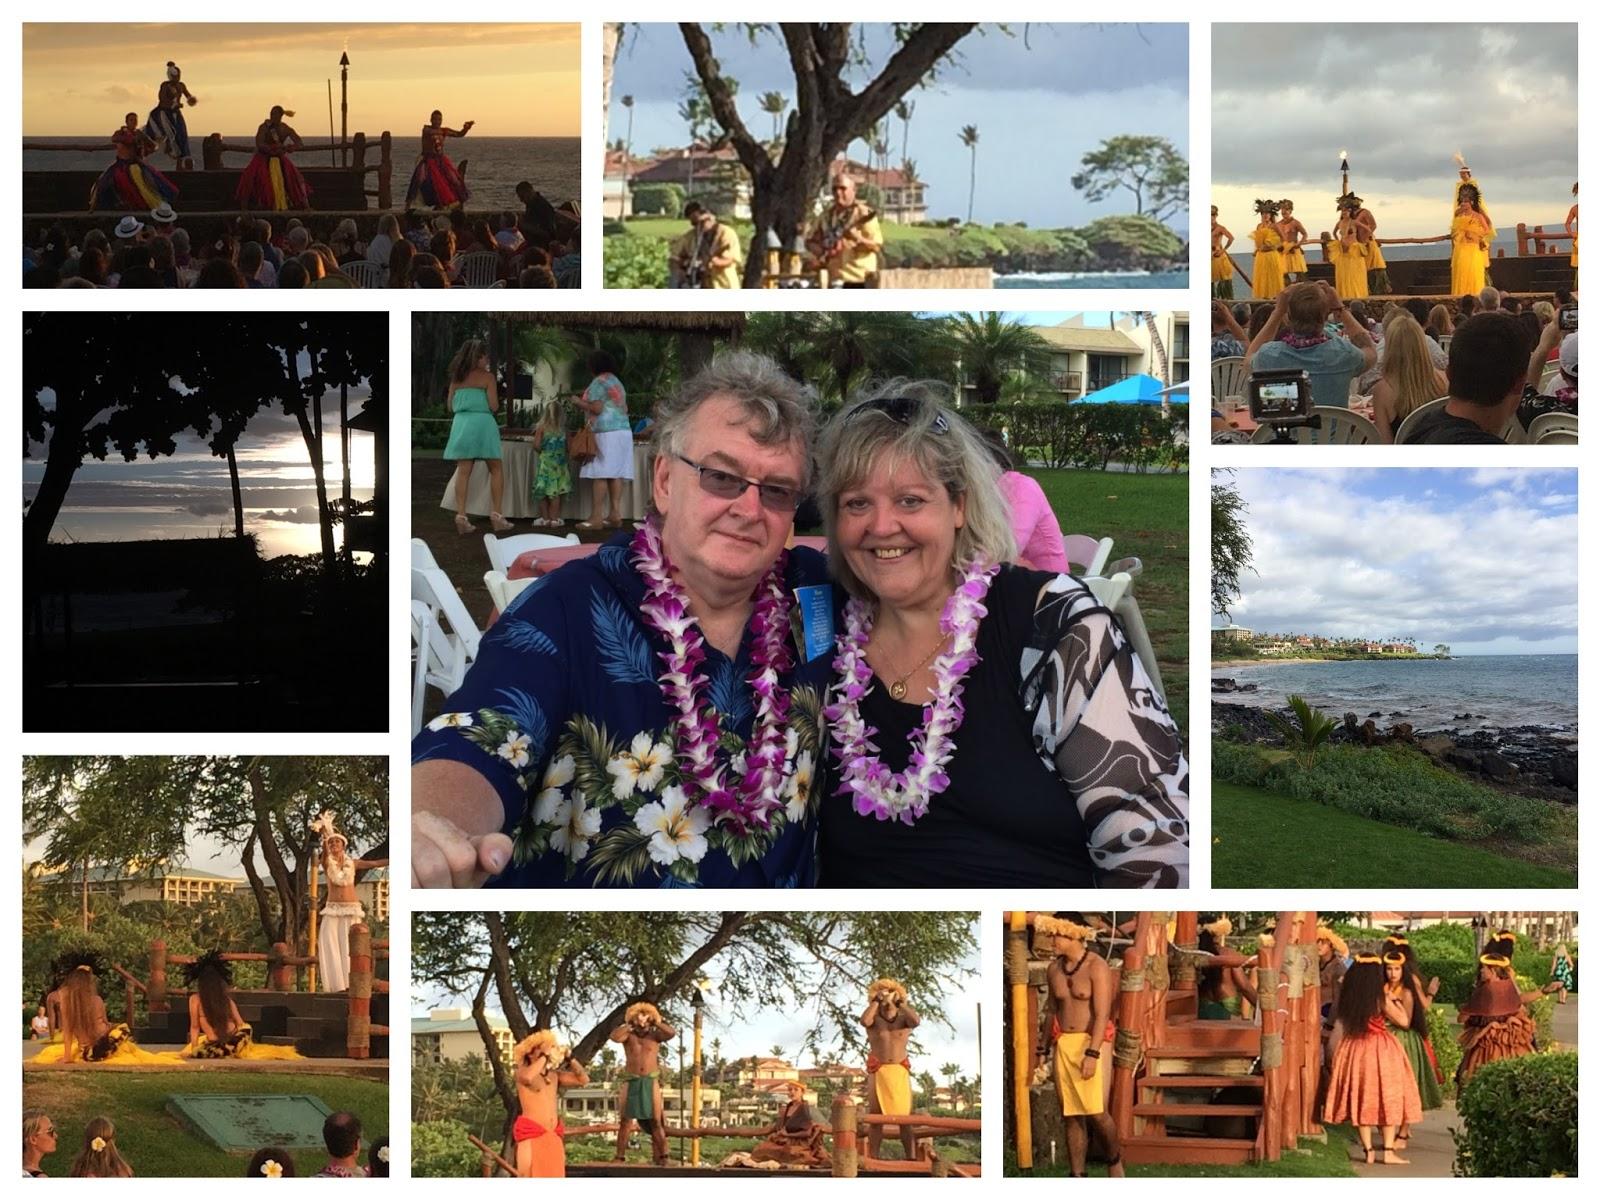 Traumurlaub USA und Hawaii